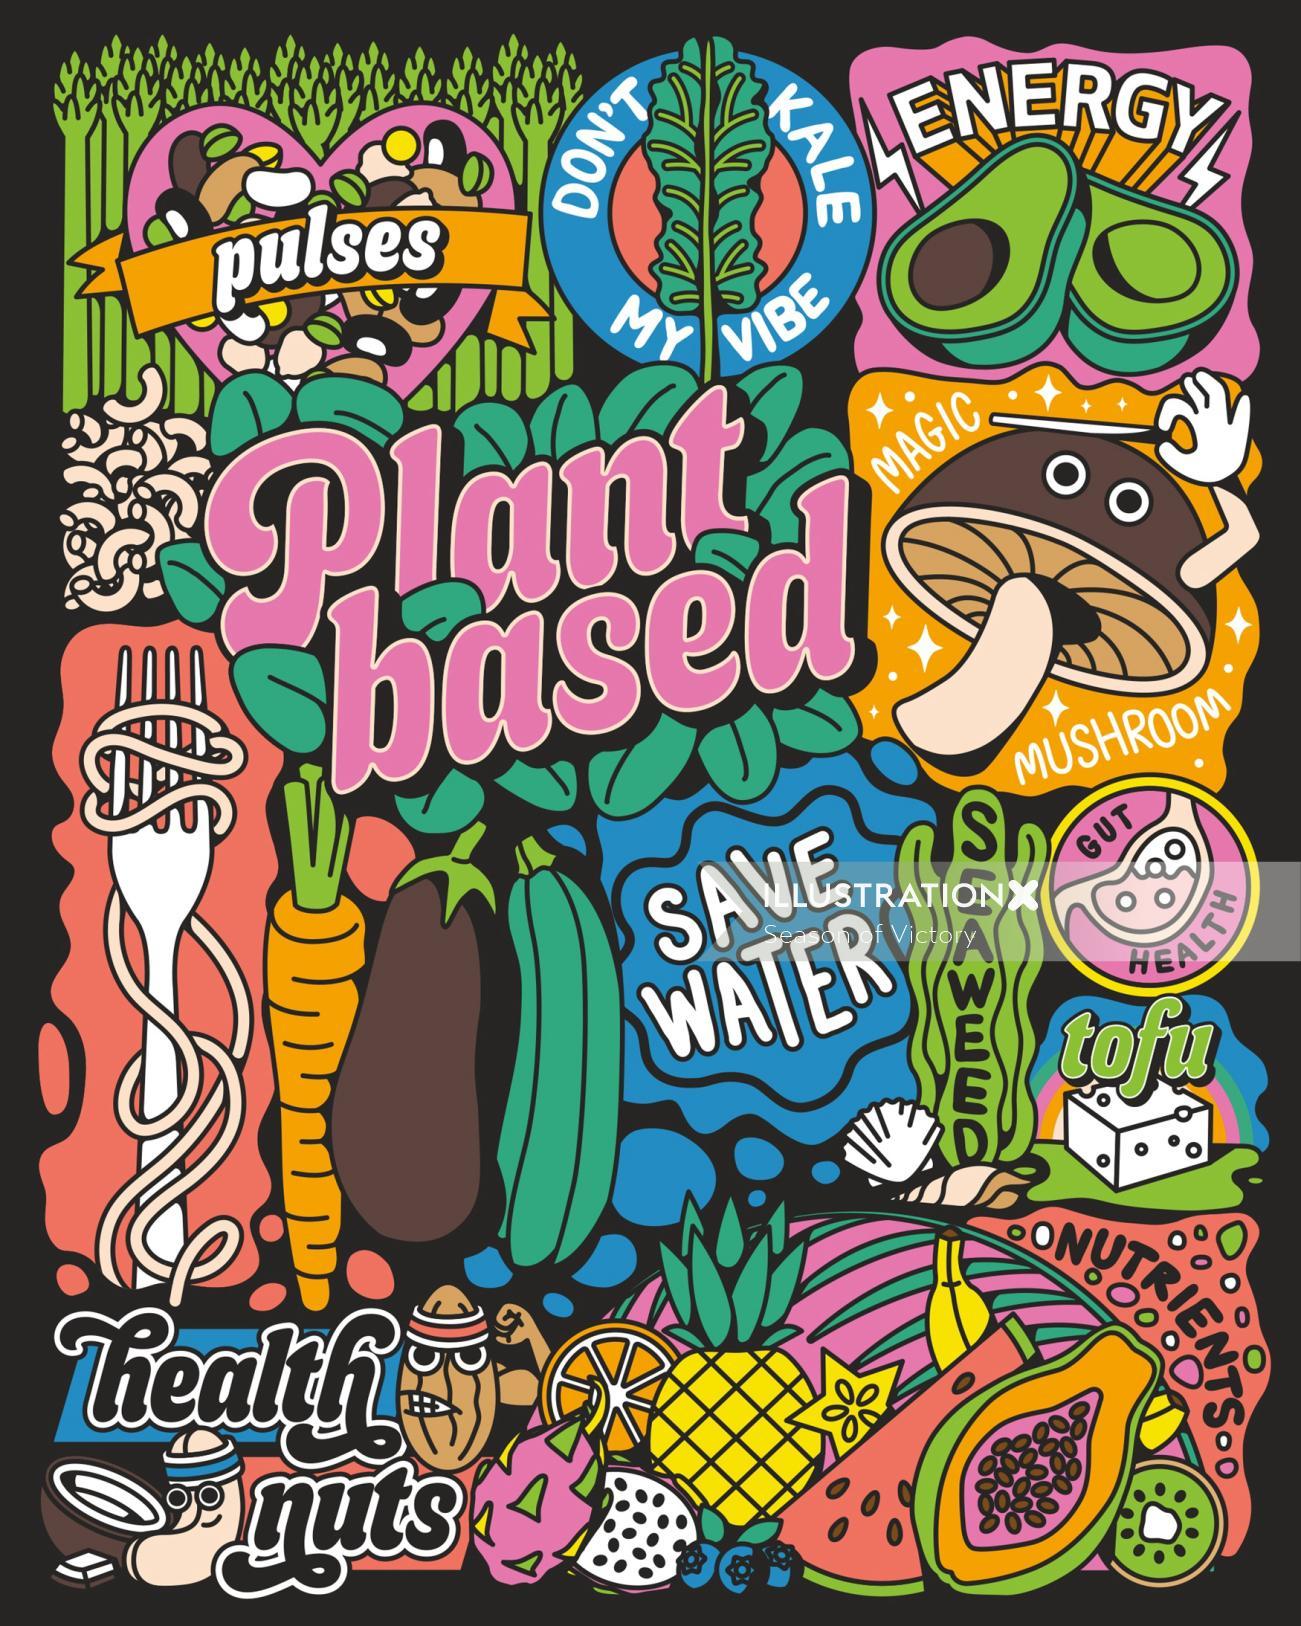 plantbased, plant based, vegan, vegan illustration, vegan festival, plant based festival, festival p